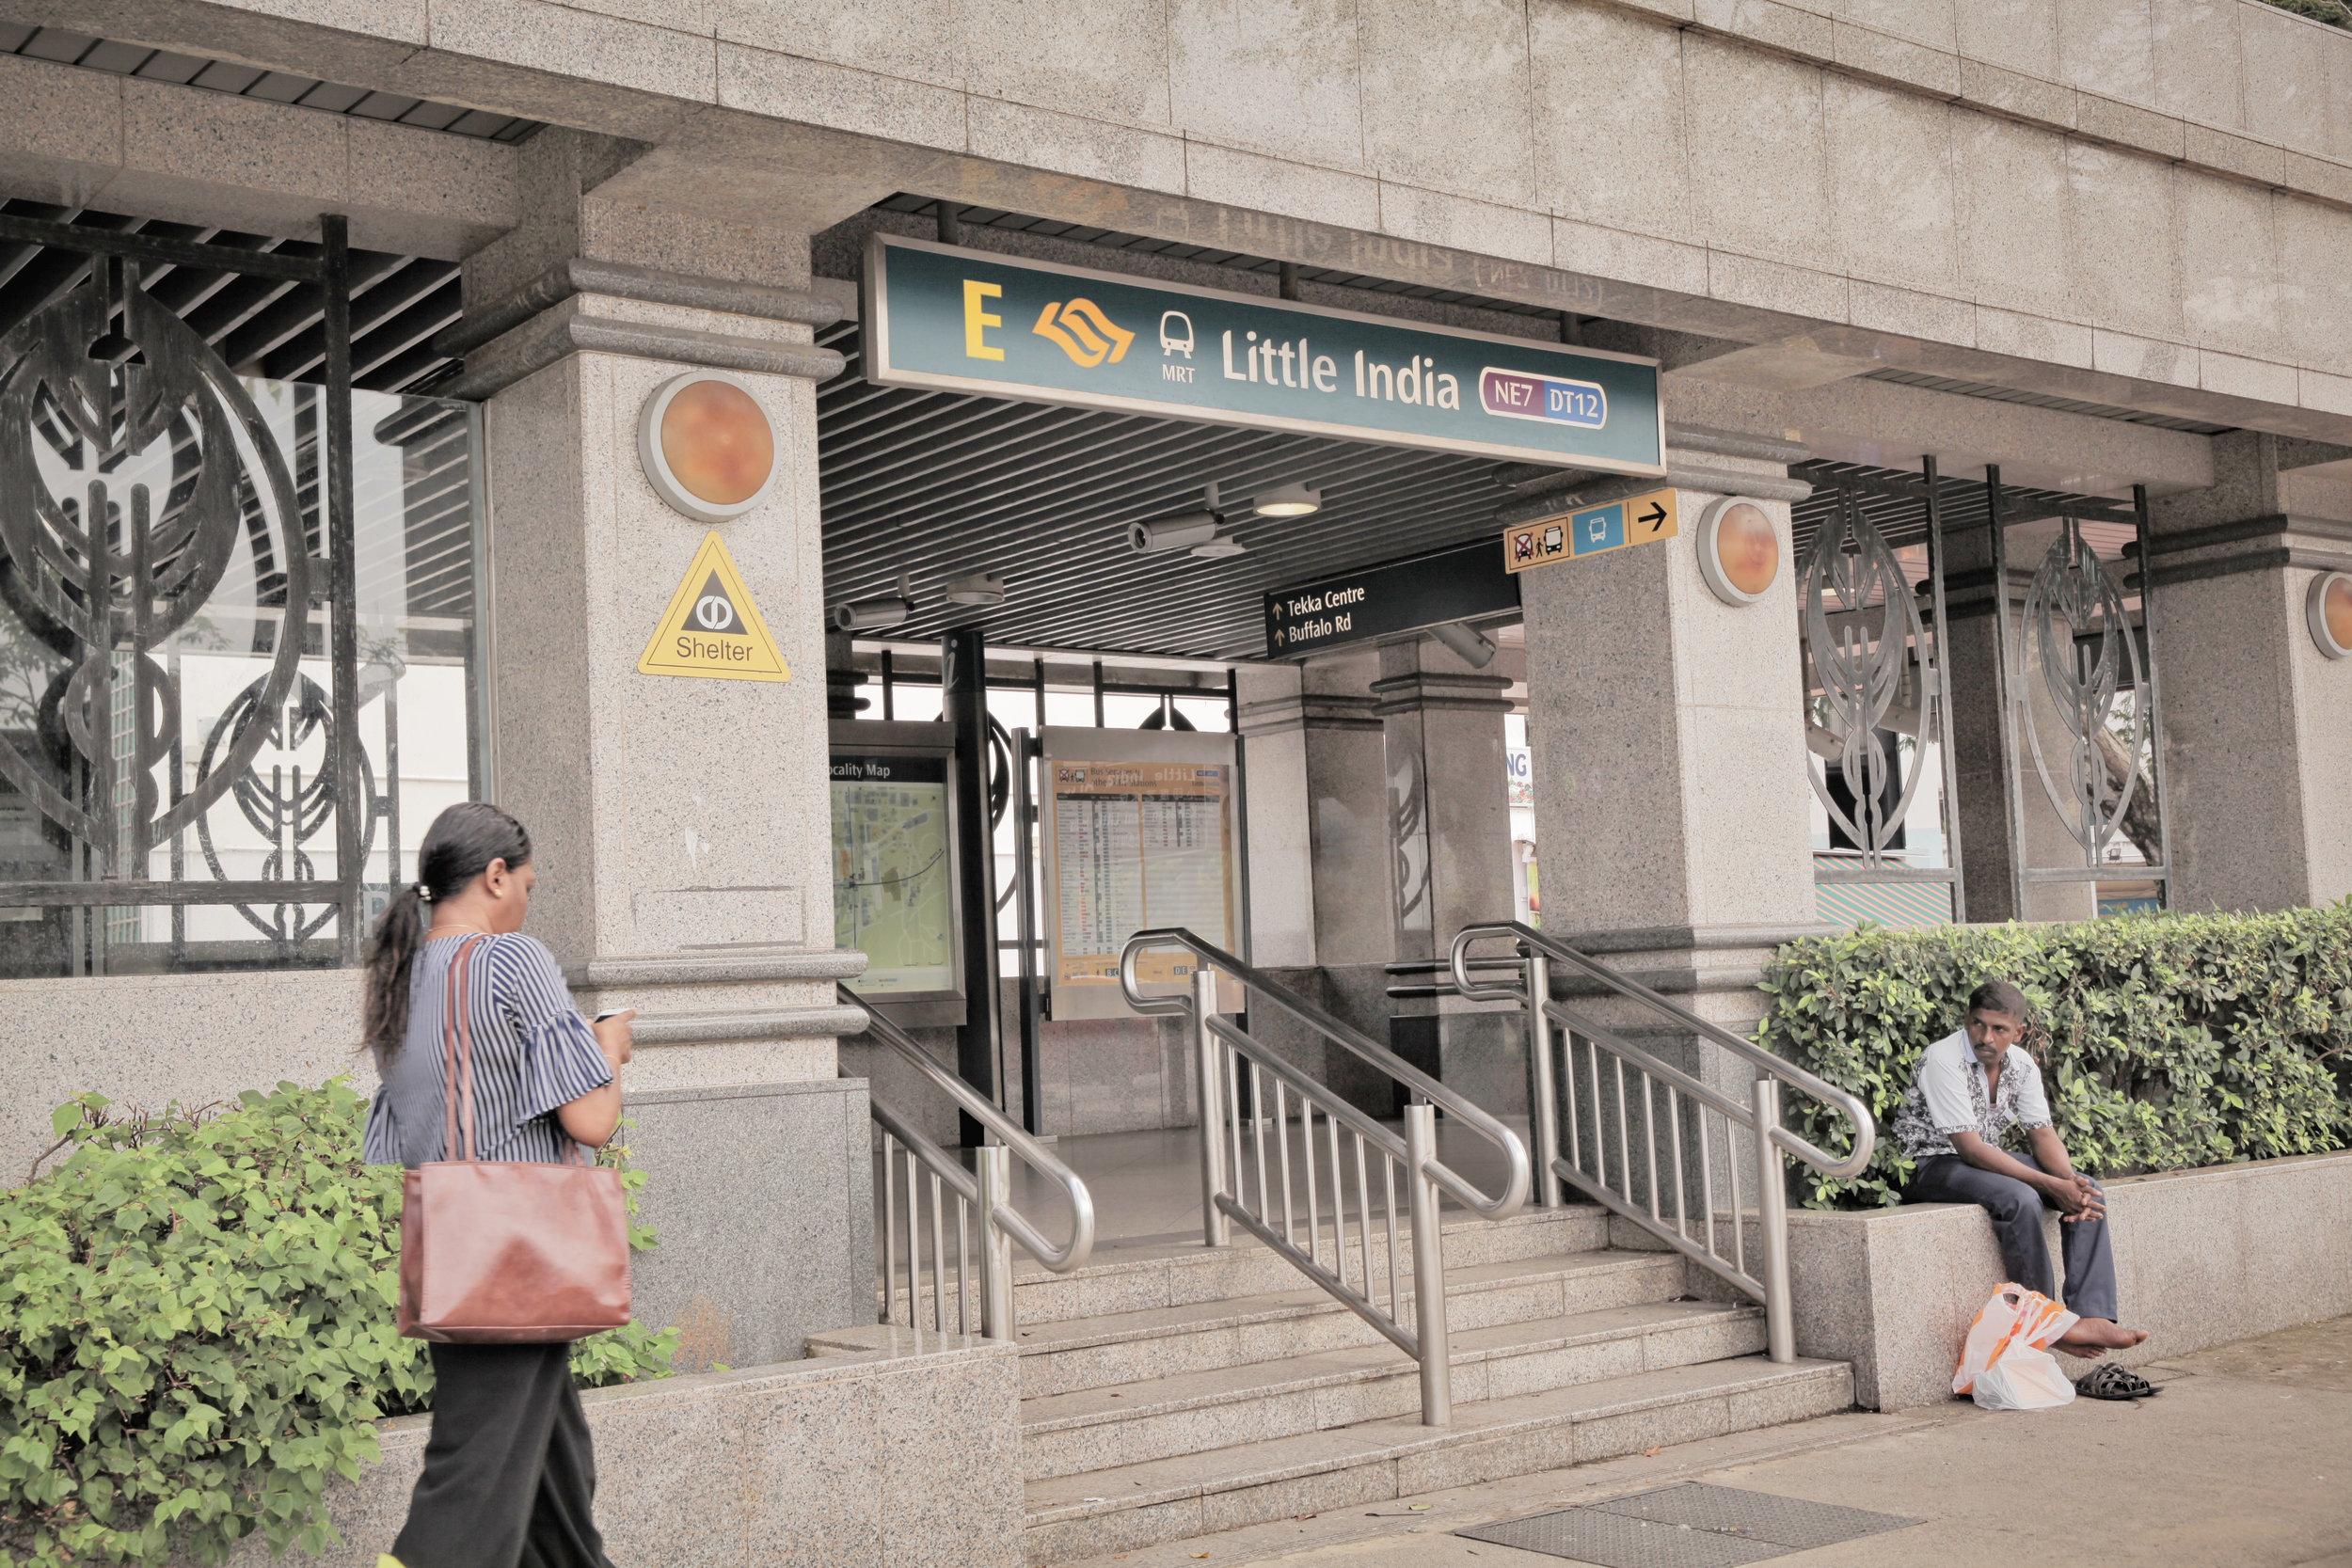 2. Leave  Little India Station  via  EXIT E